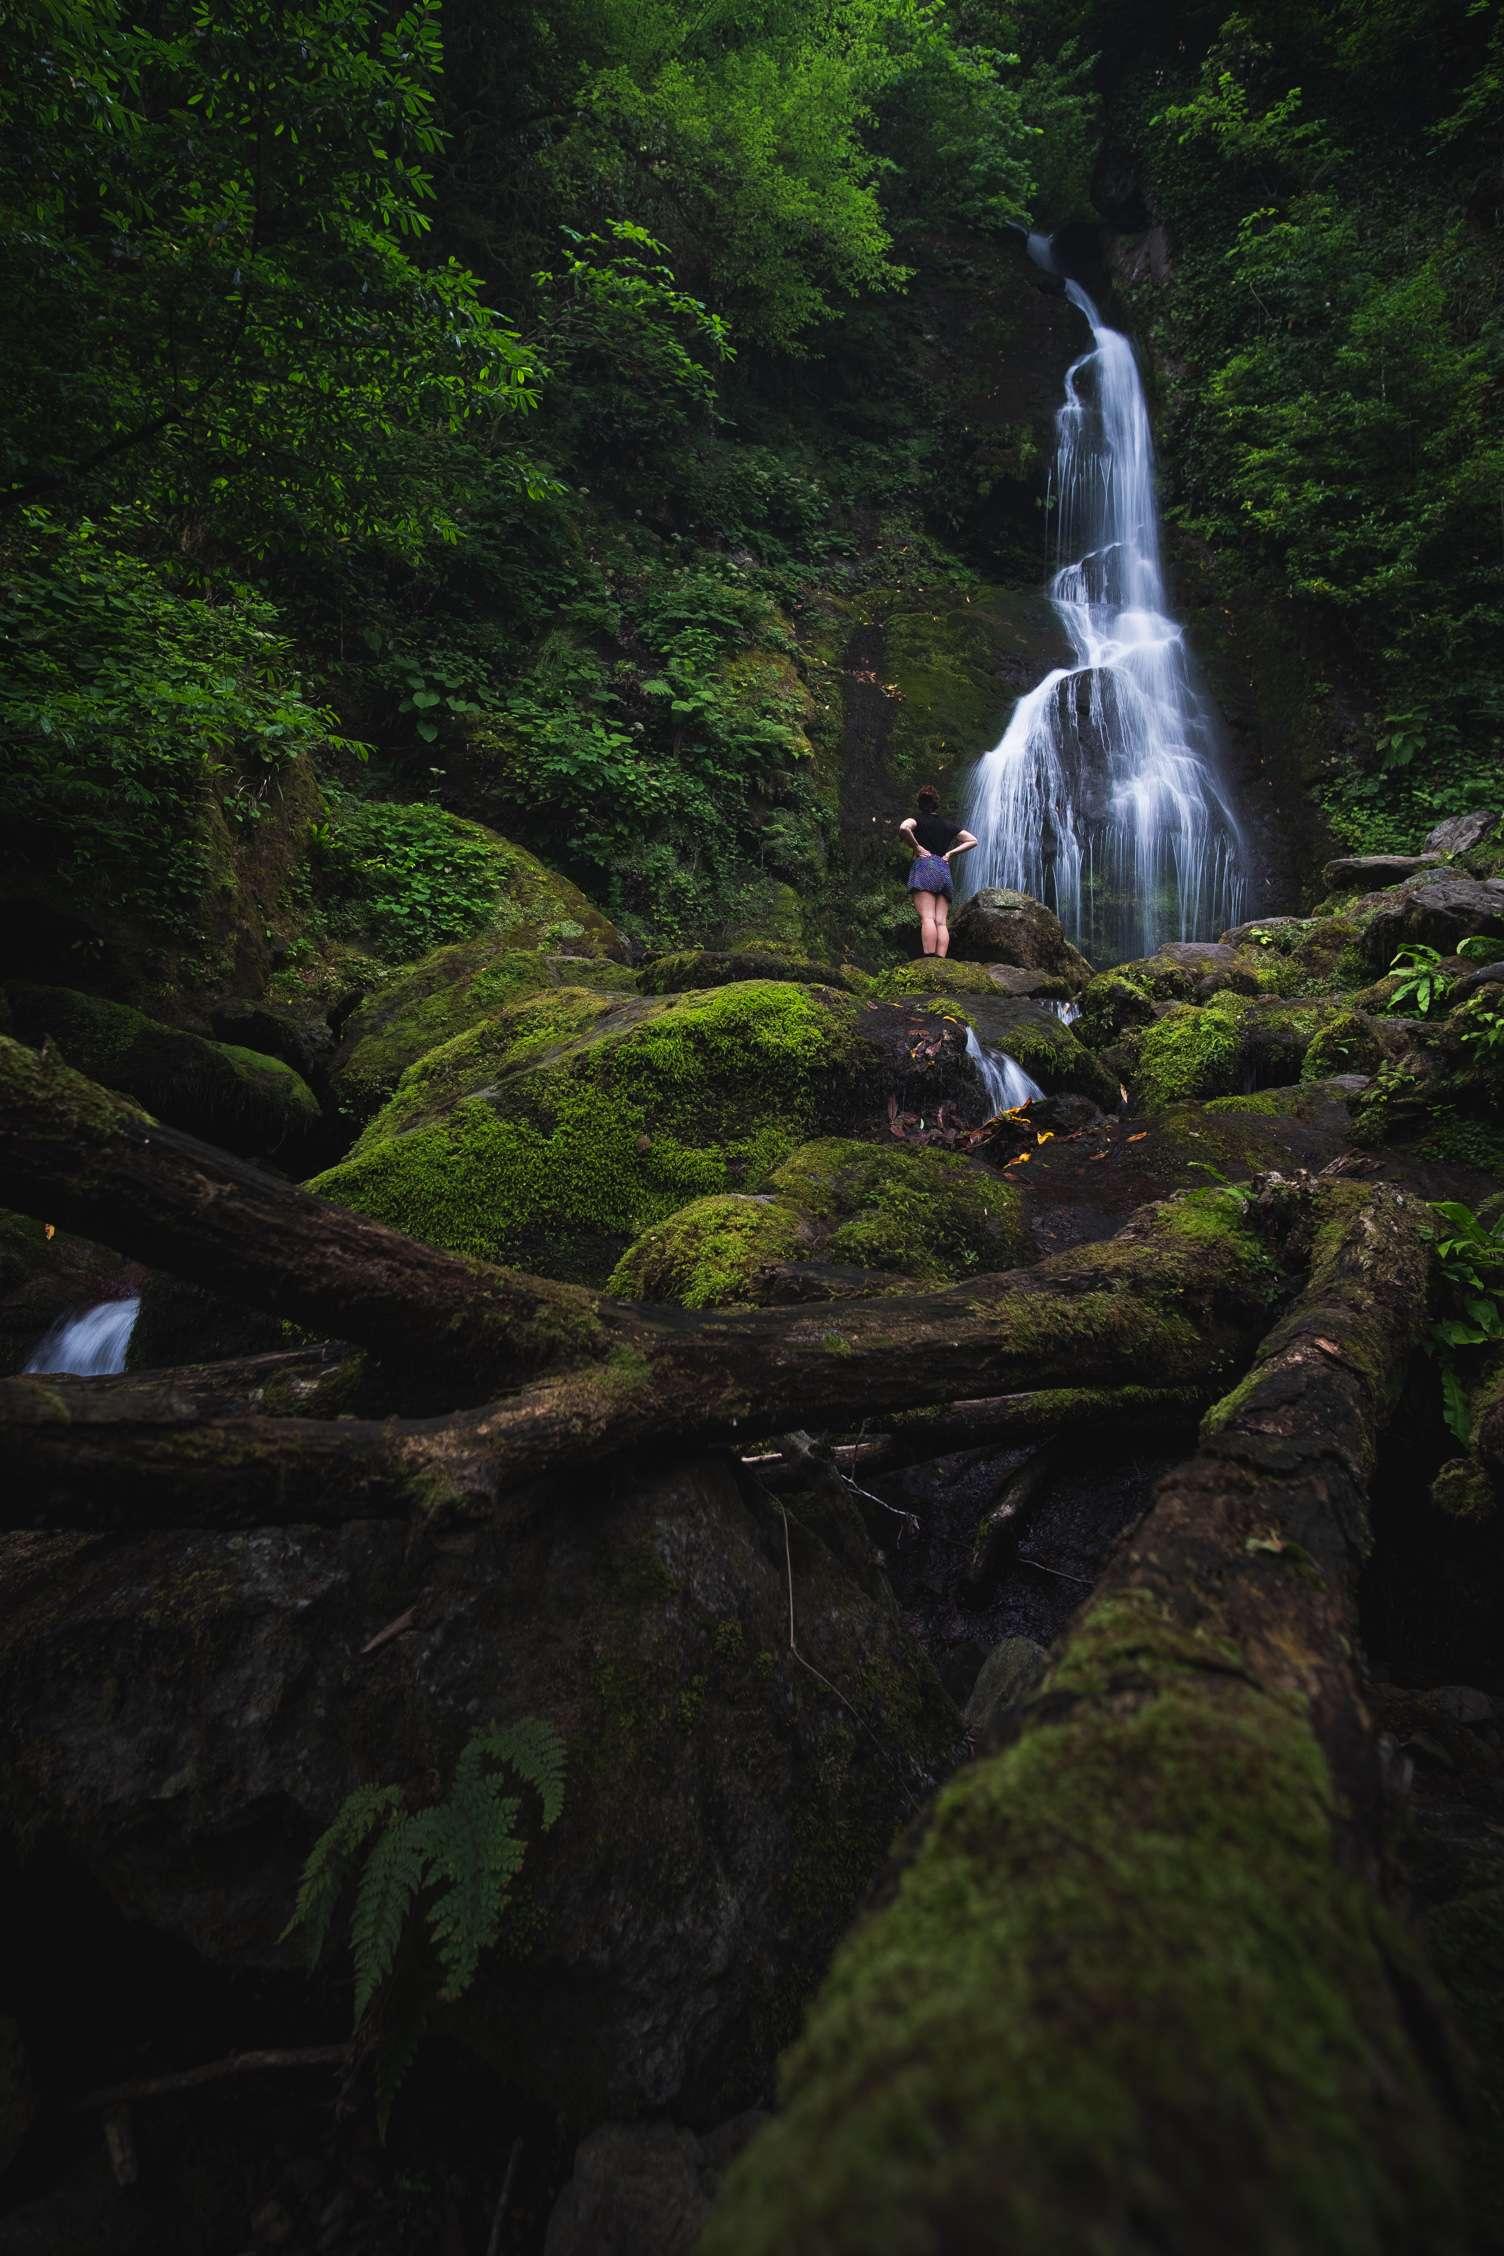 Caroline in front of Tsalbnari waterfall in Mtirala National Park